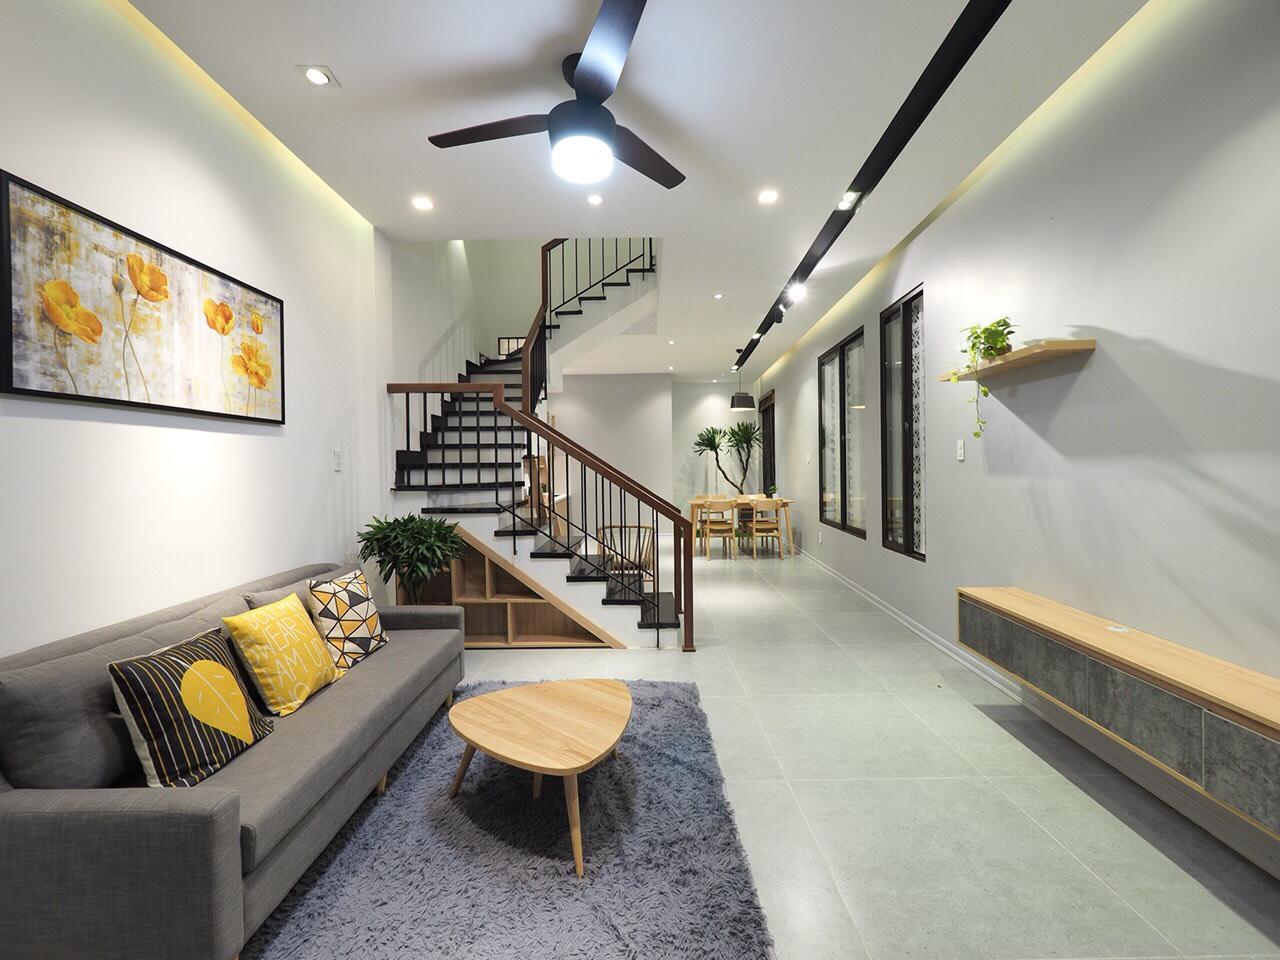 4 BEDROOM MODERN HOUSE FOR RENT NEAR DRAGON BRIDGE   🍂 ST.H.B0045